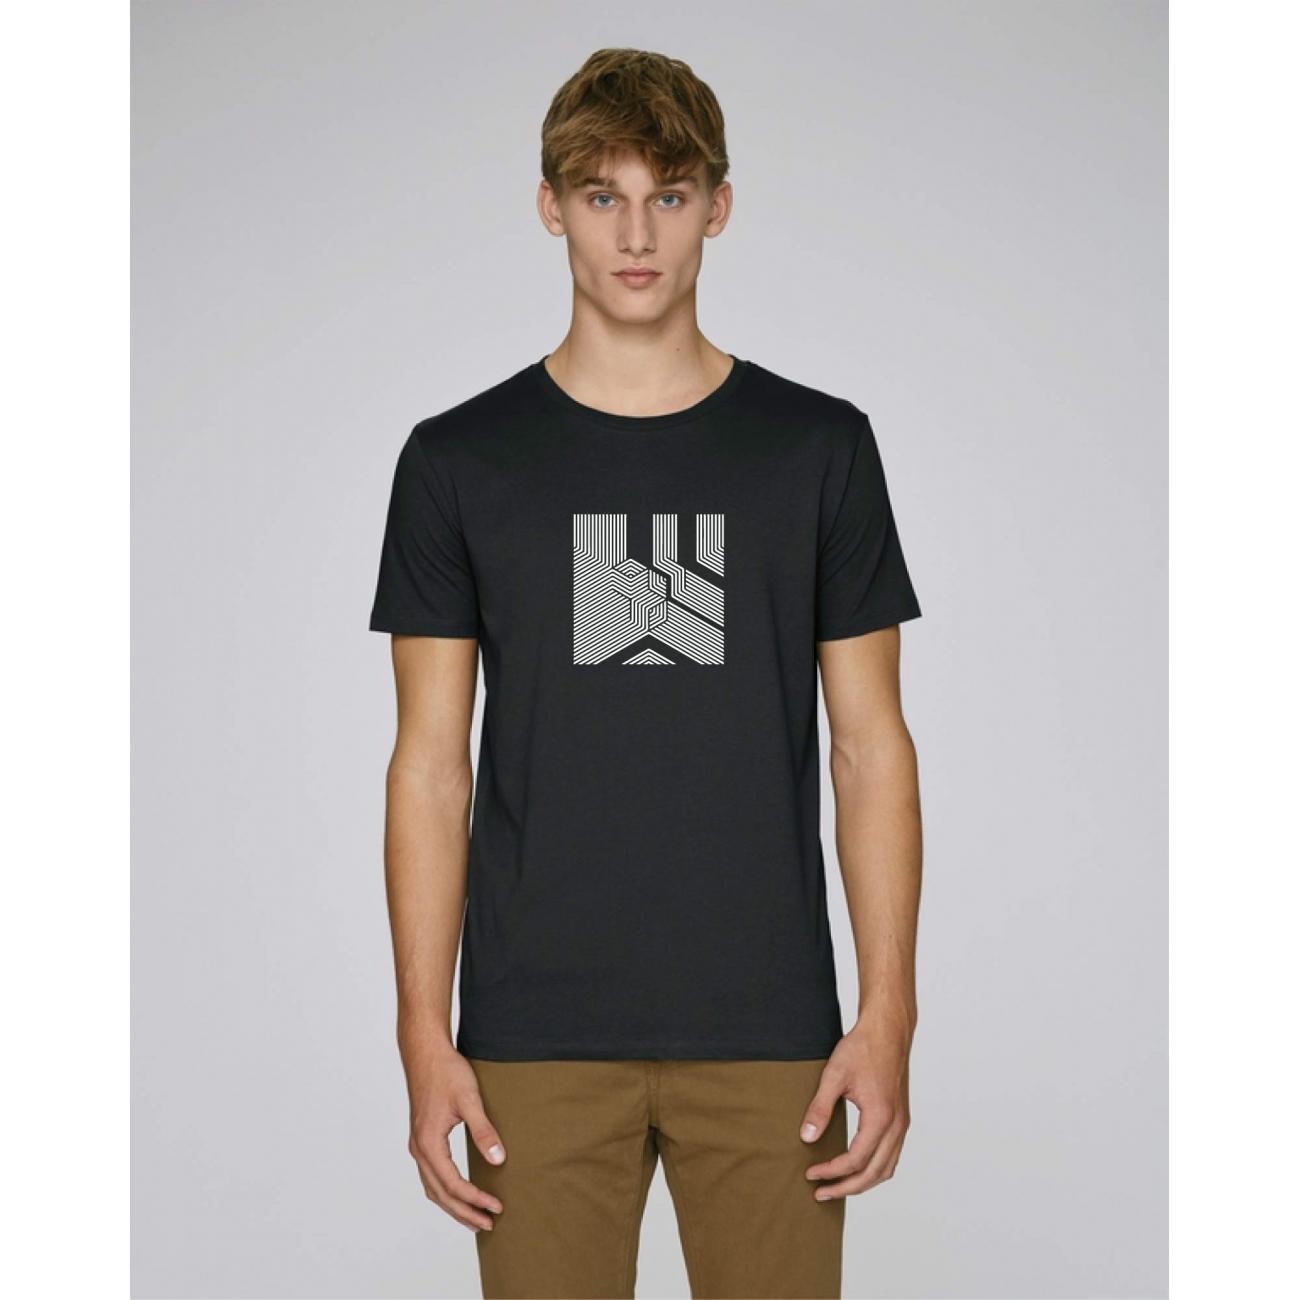 https://tee-shirt-bio.com/6217-thickbox_default/tee-shirt-coton-bio-noir-homme-impression-cube-blanc.jpg